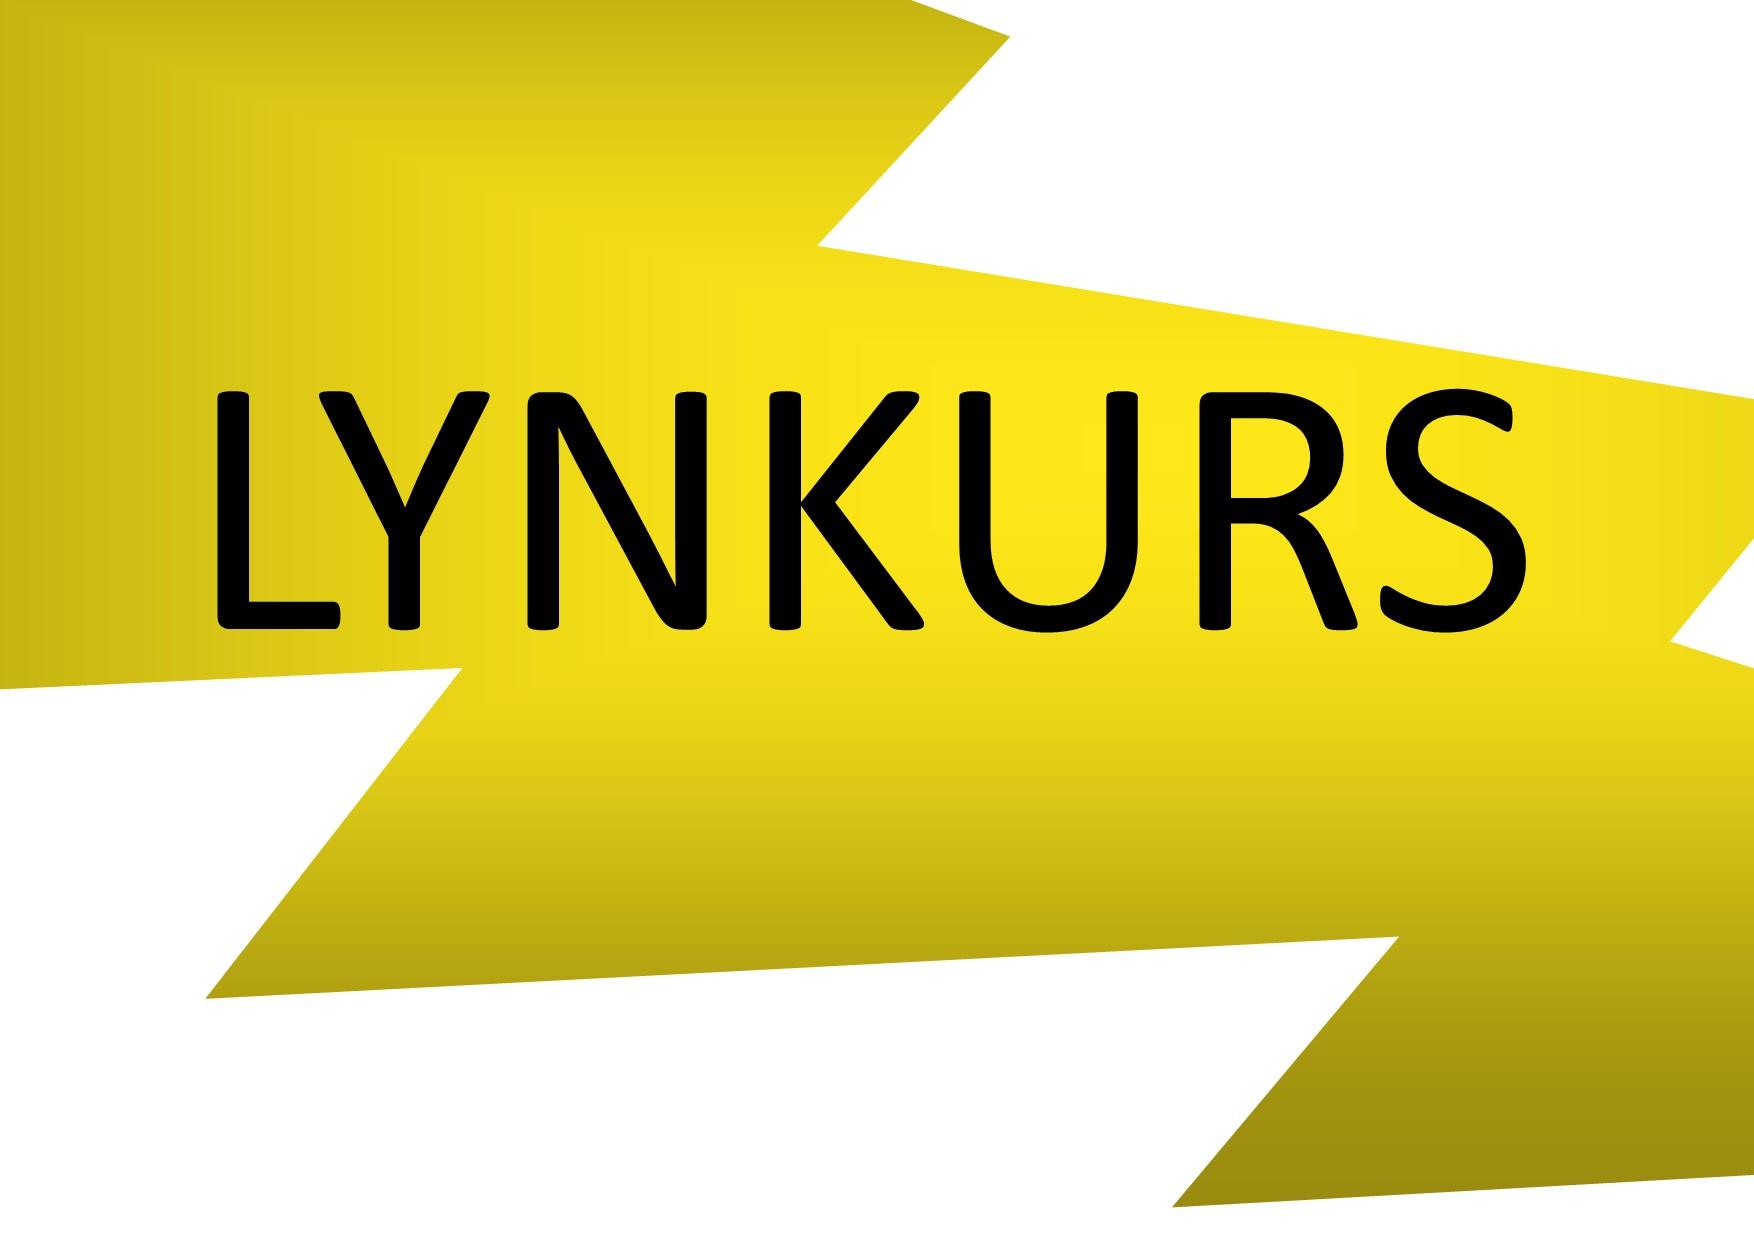 Lynkurs på Øya høsten 2019